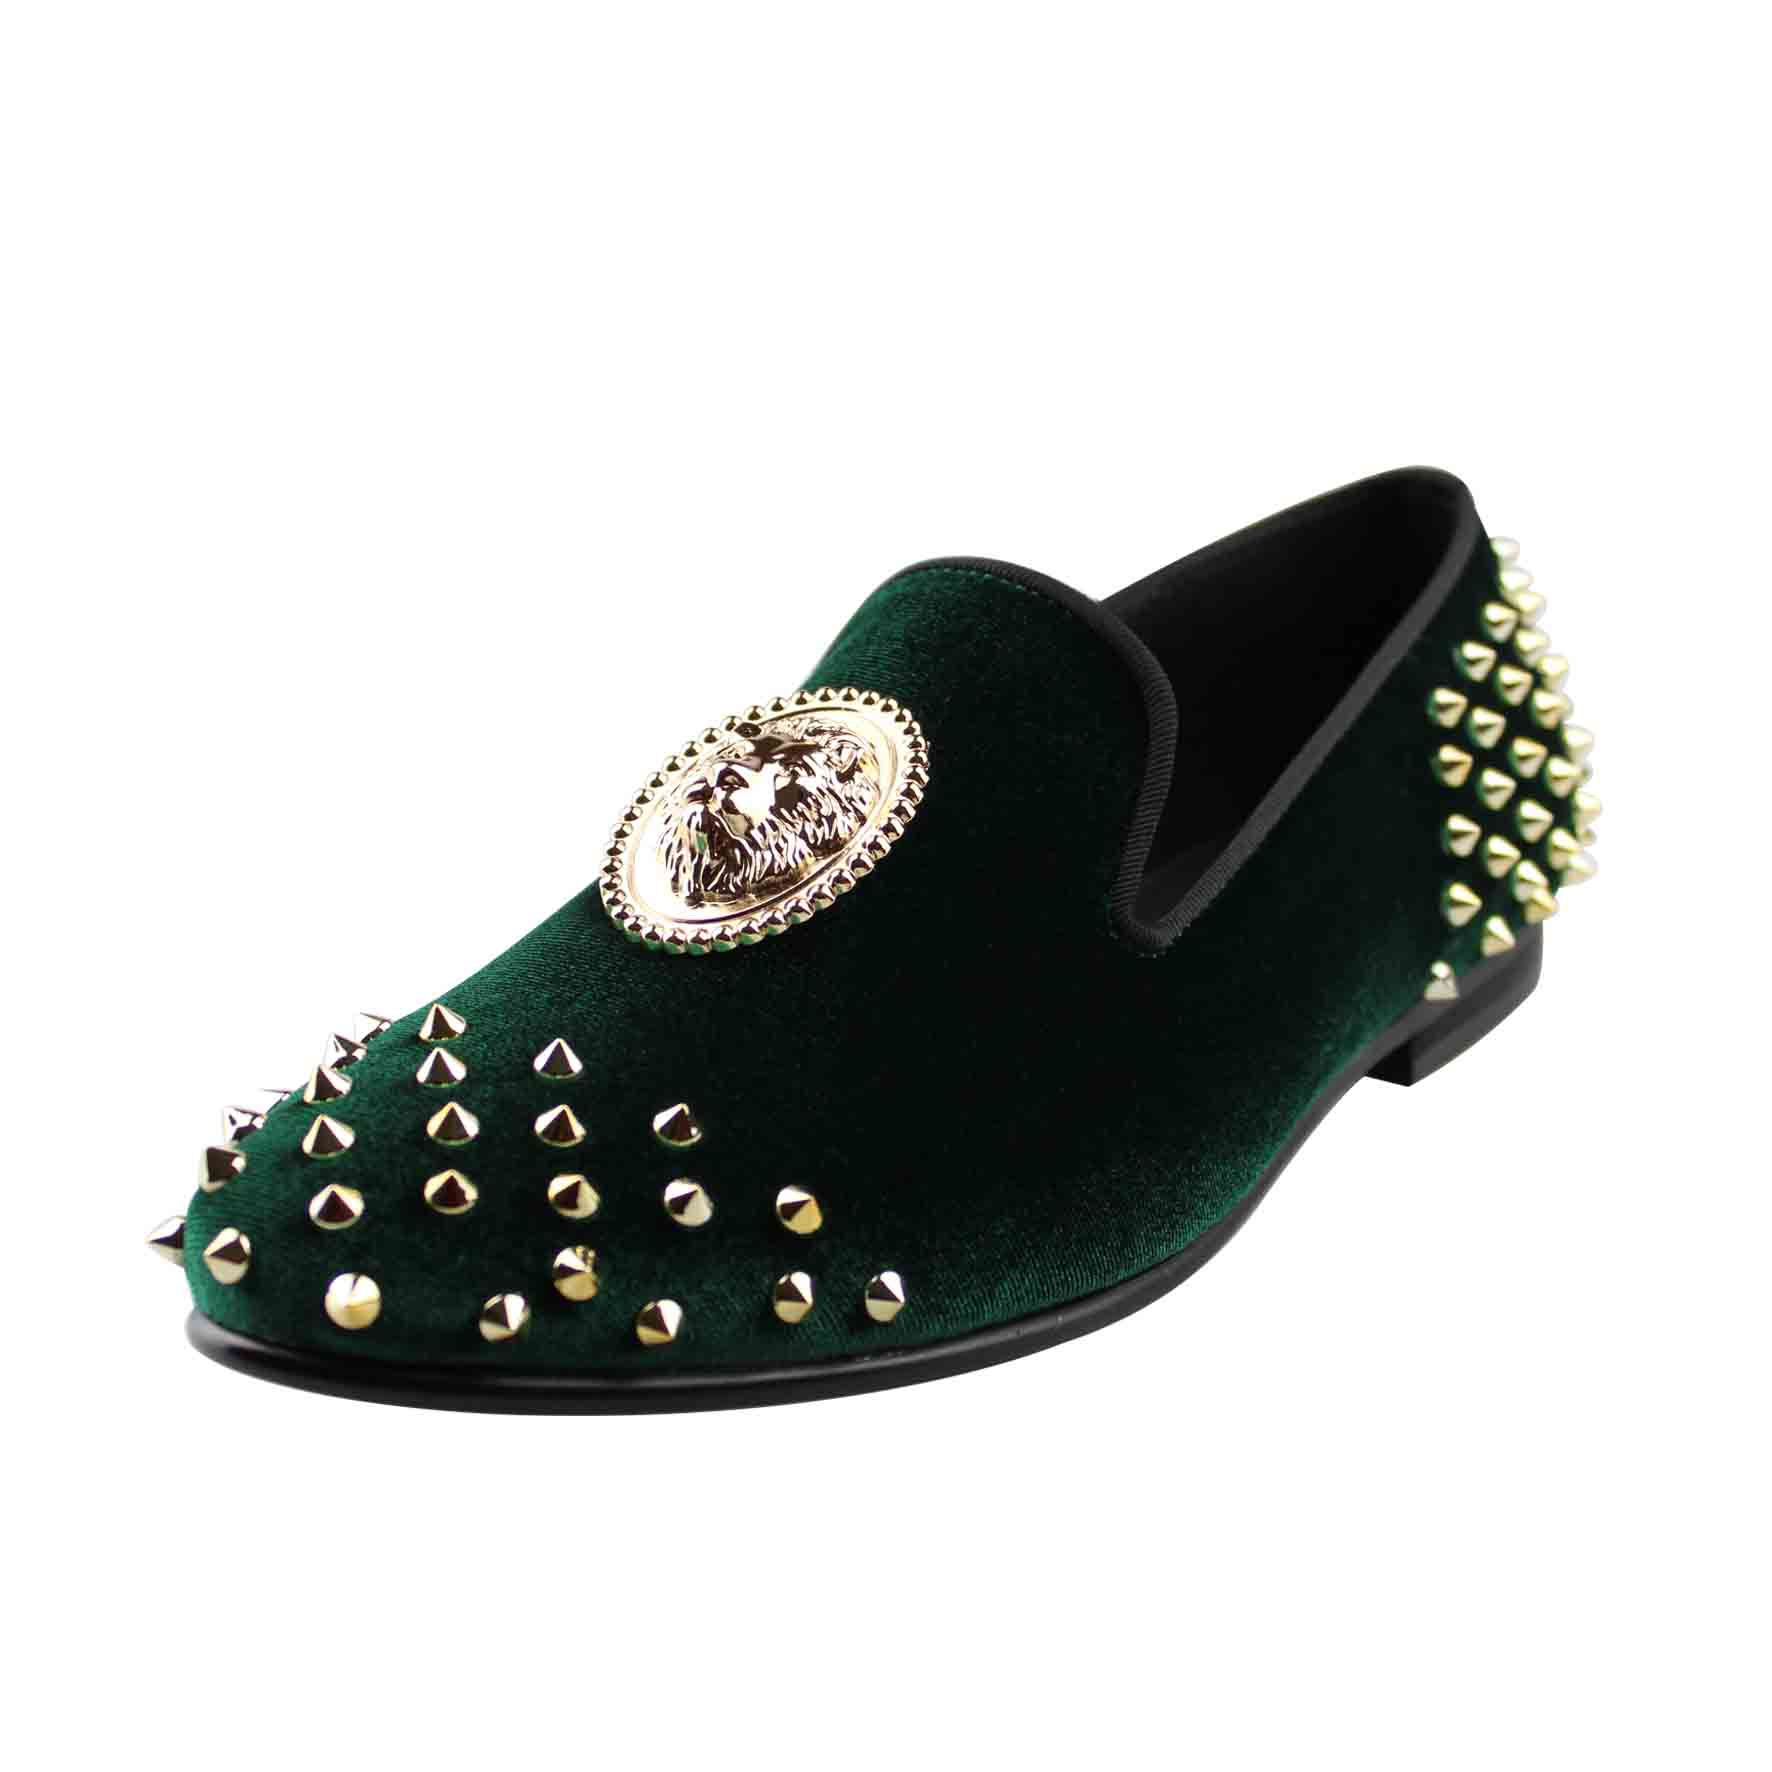 Harpelunde Men Spike Shoes Green Velvet Loafer Slippers Animal Buckle Footwear